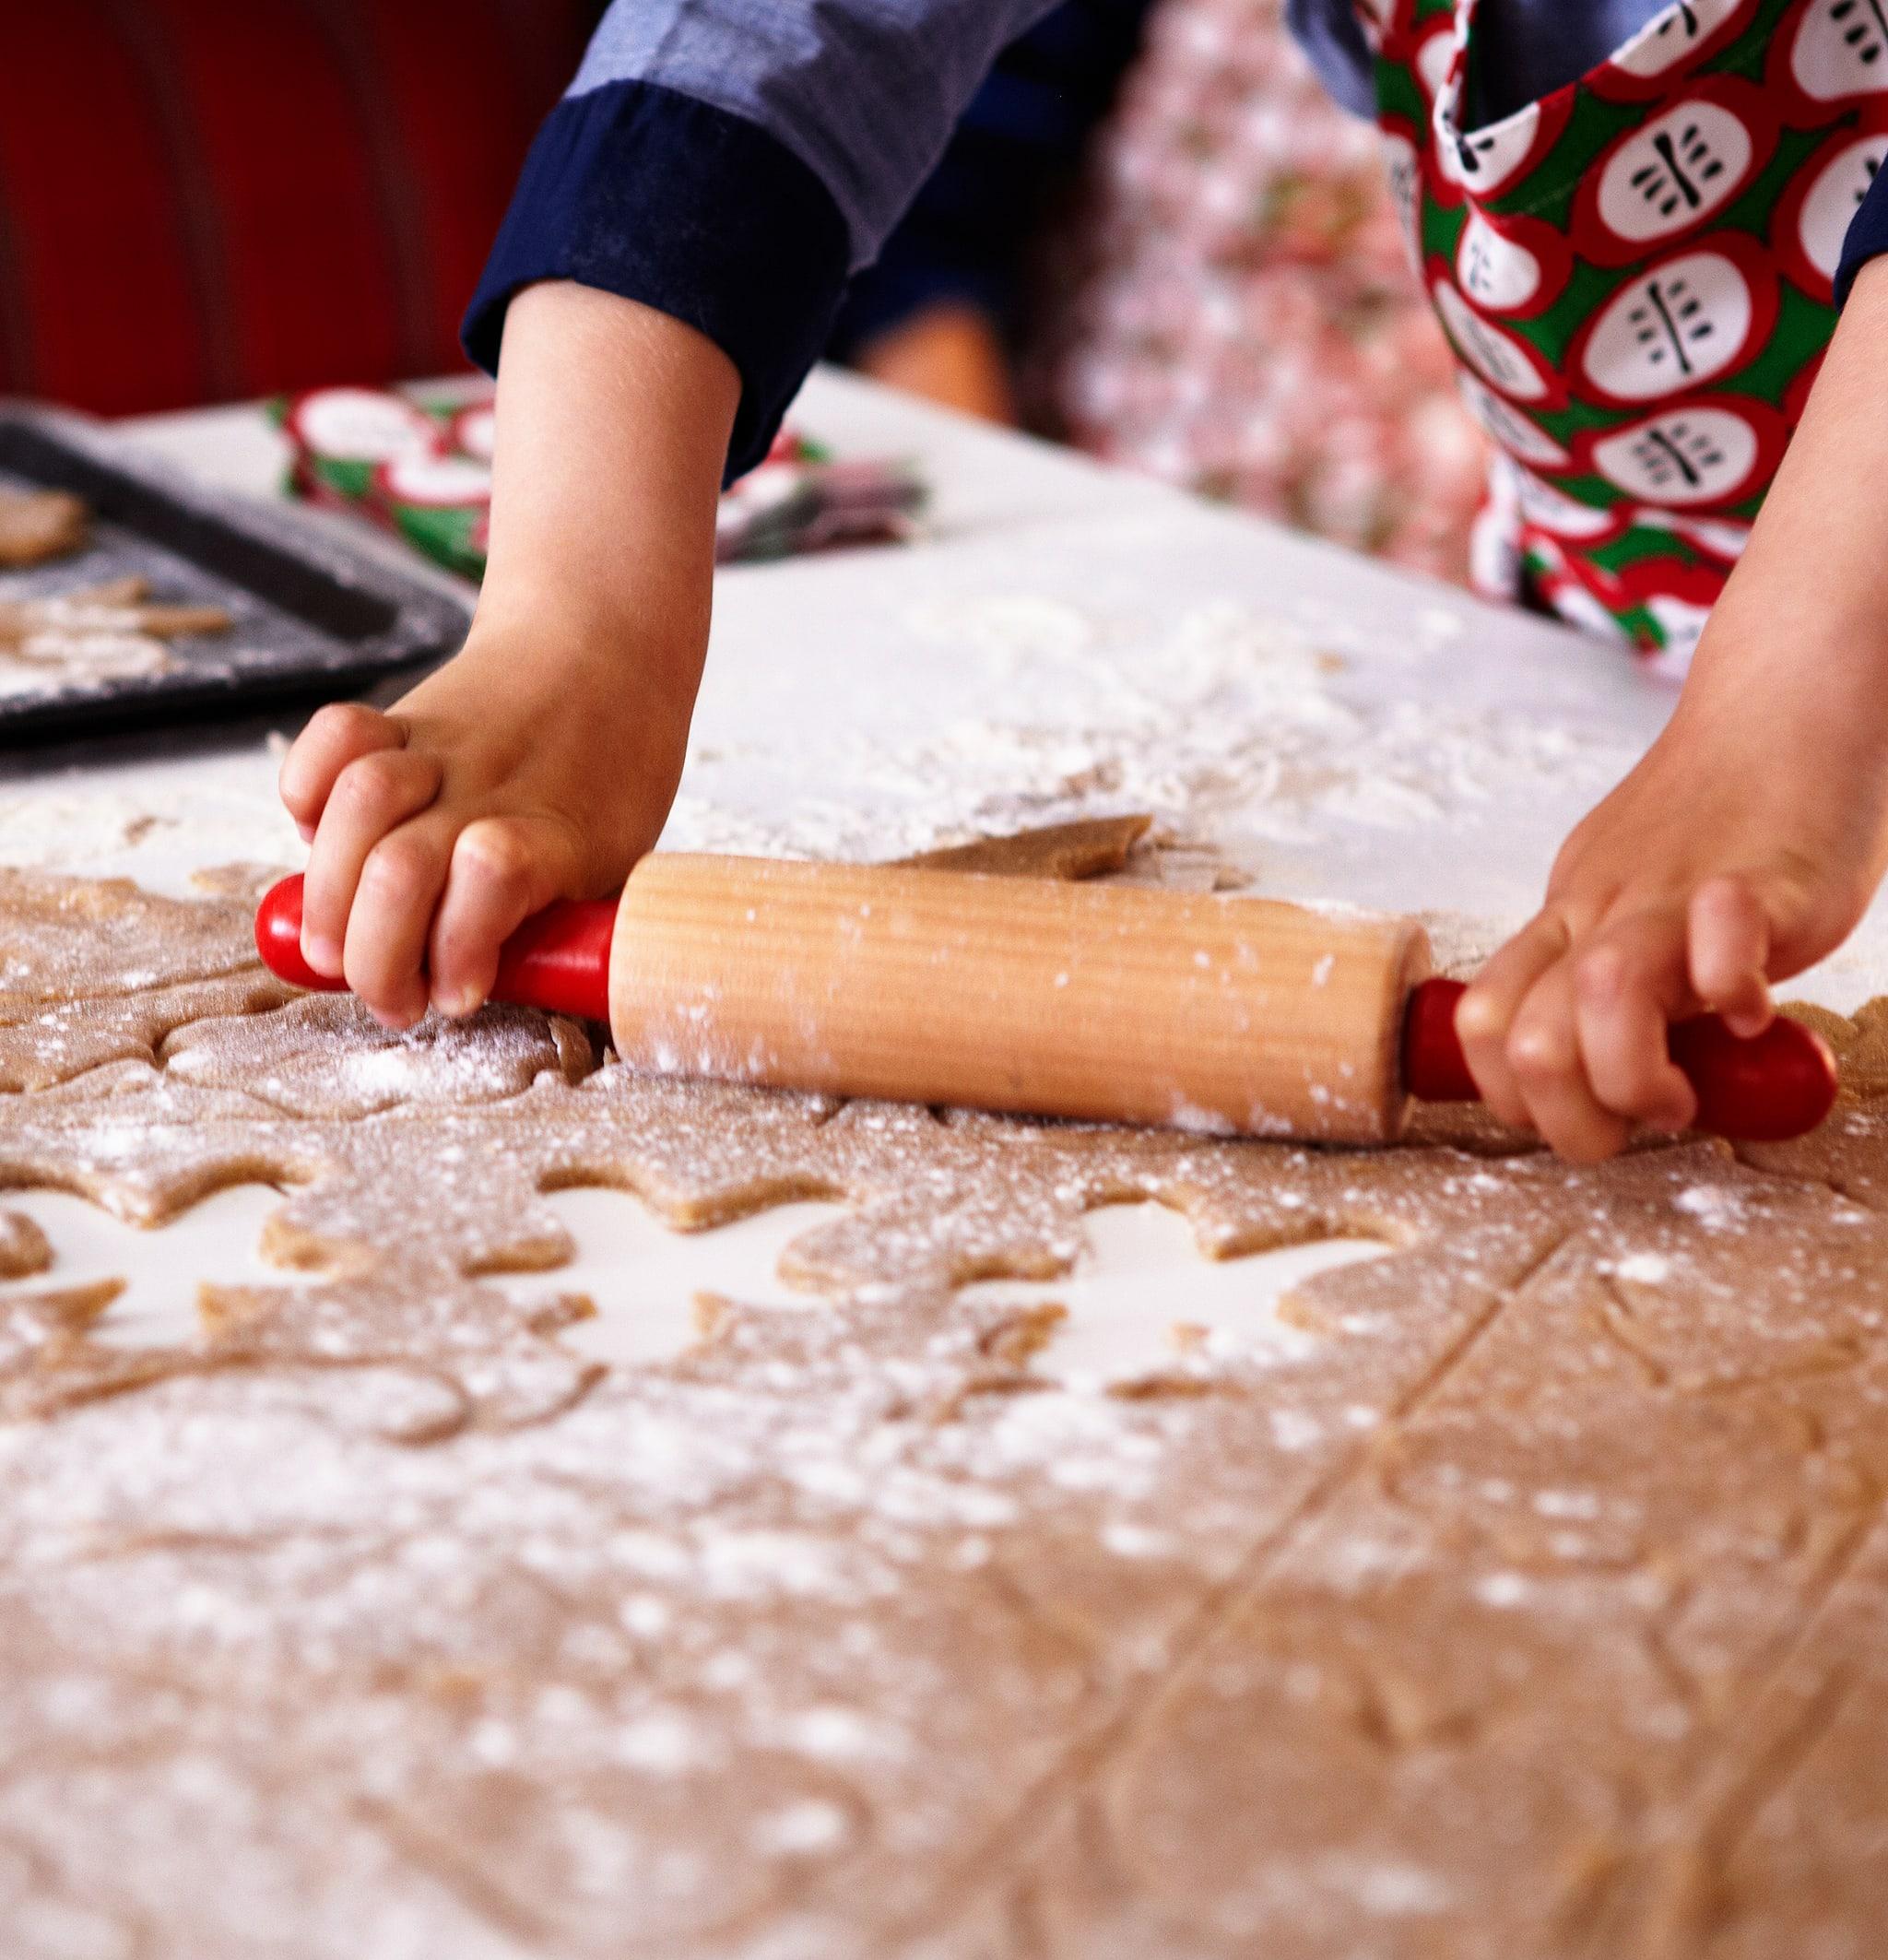 Tangan anak yang mengenakan celemek memegang penggiling adonan, mengerjakan selembar adonan kue jahe yang ditaburi tepung yang telah dipotong.